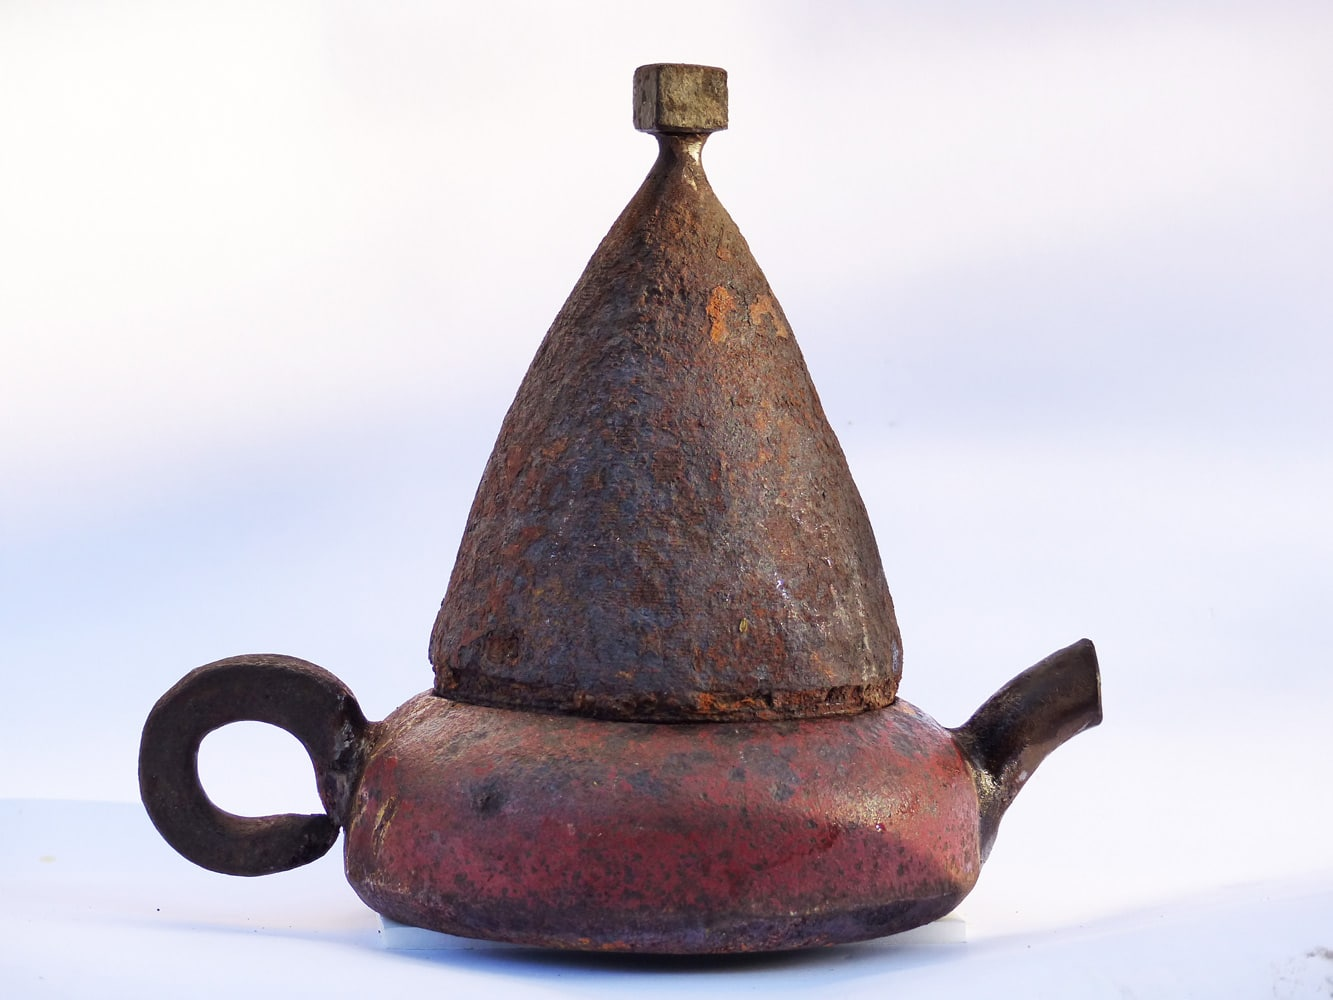 Chris-Kircher-Skulptur-aus-Stahl-Teekanne-1